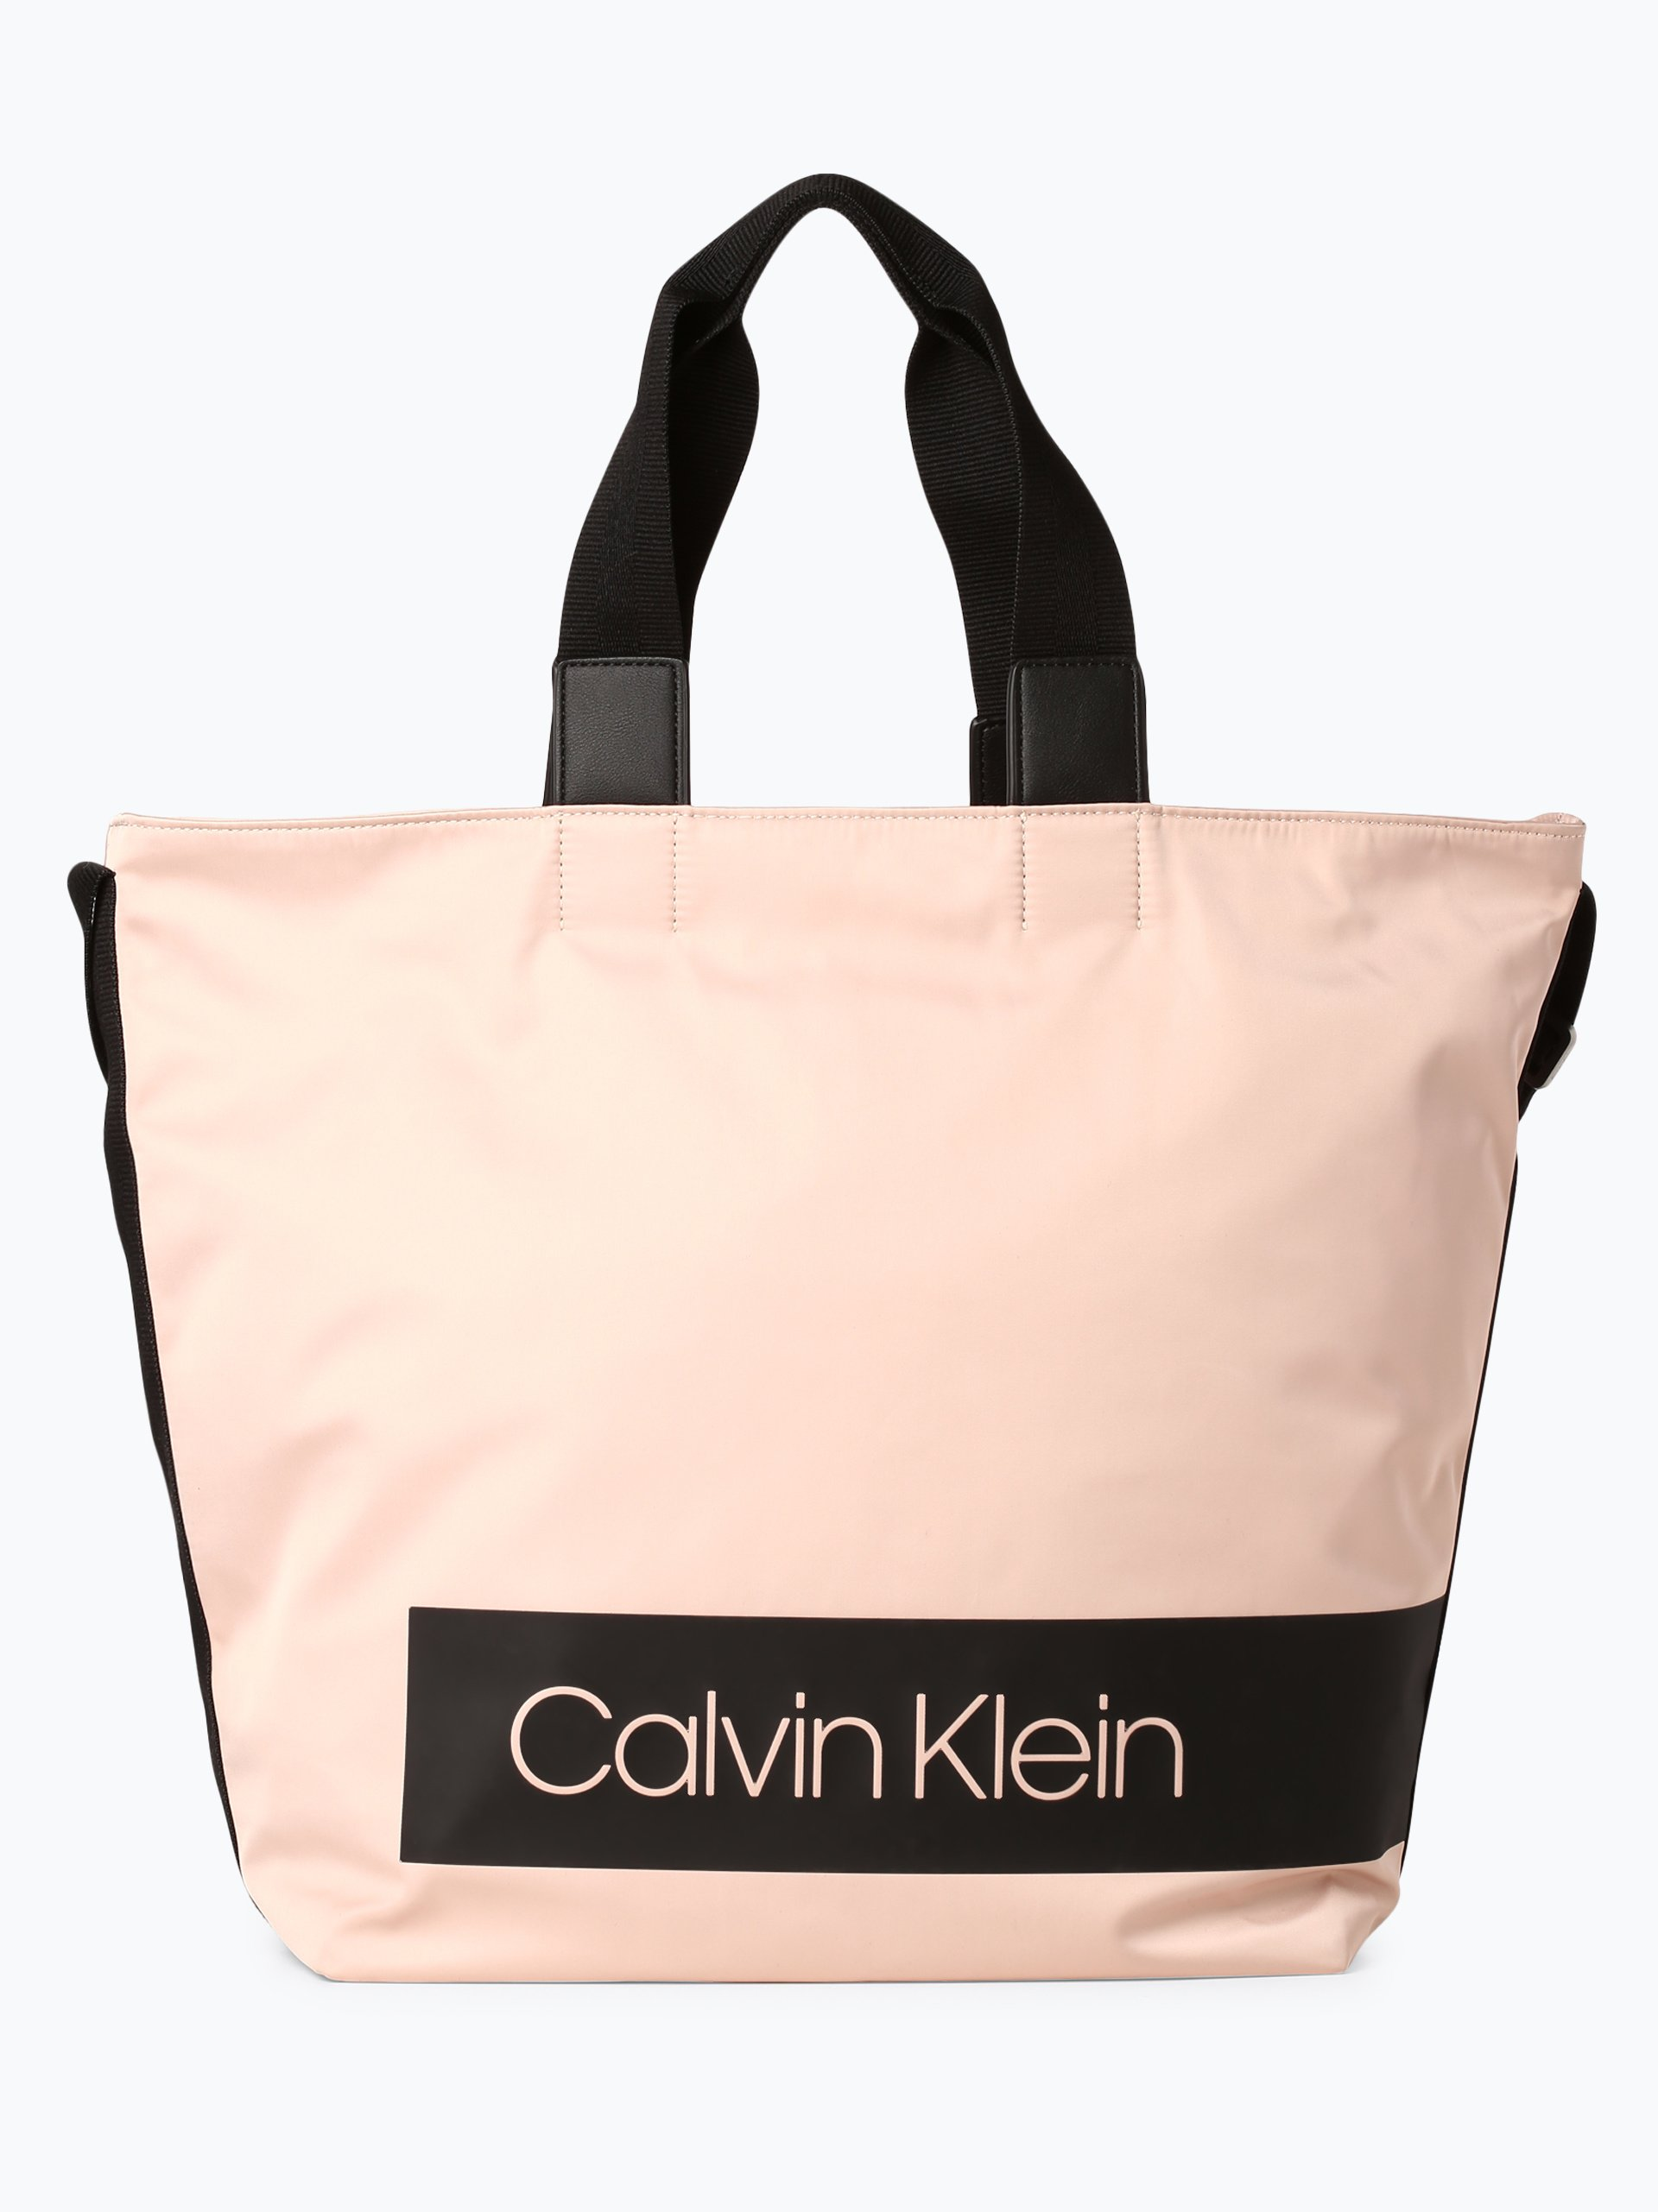 calvin klein damen shopper nude uni online kaufen. Black Bedroom Furniture Sets. Home Design Ideas